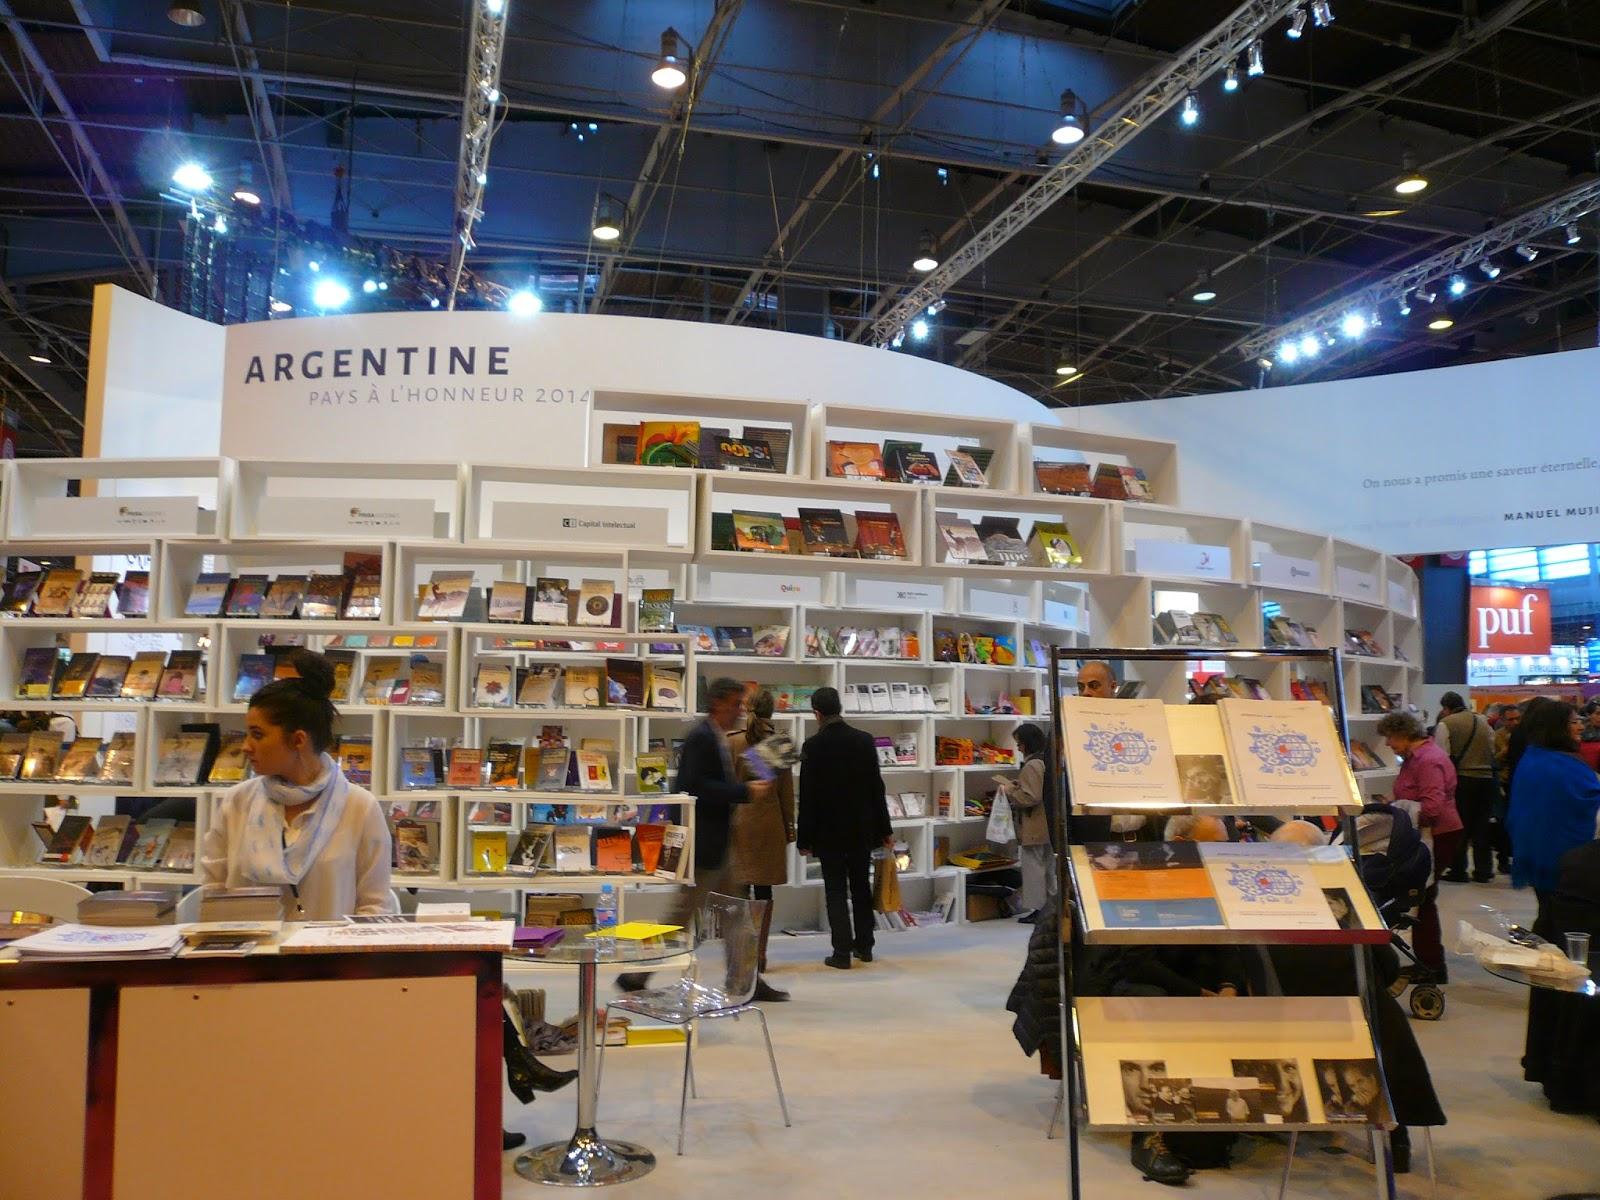 Positive eating positive living salon du livre paris 2014 - Le salon du livre paris ...